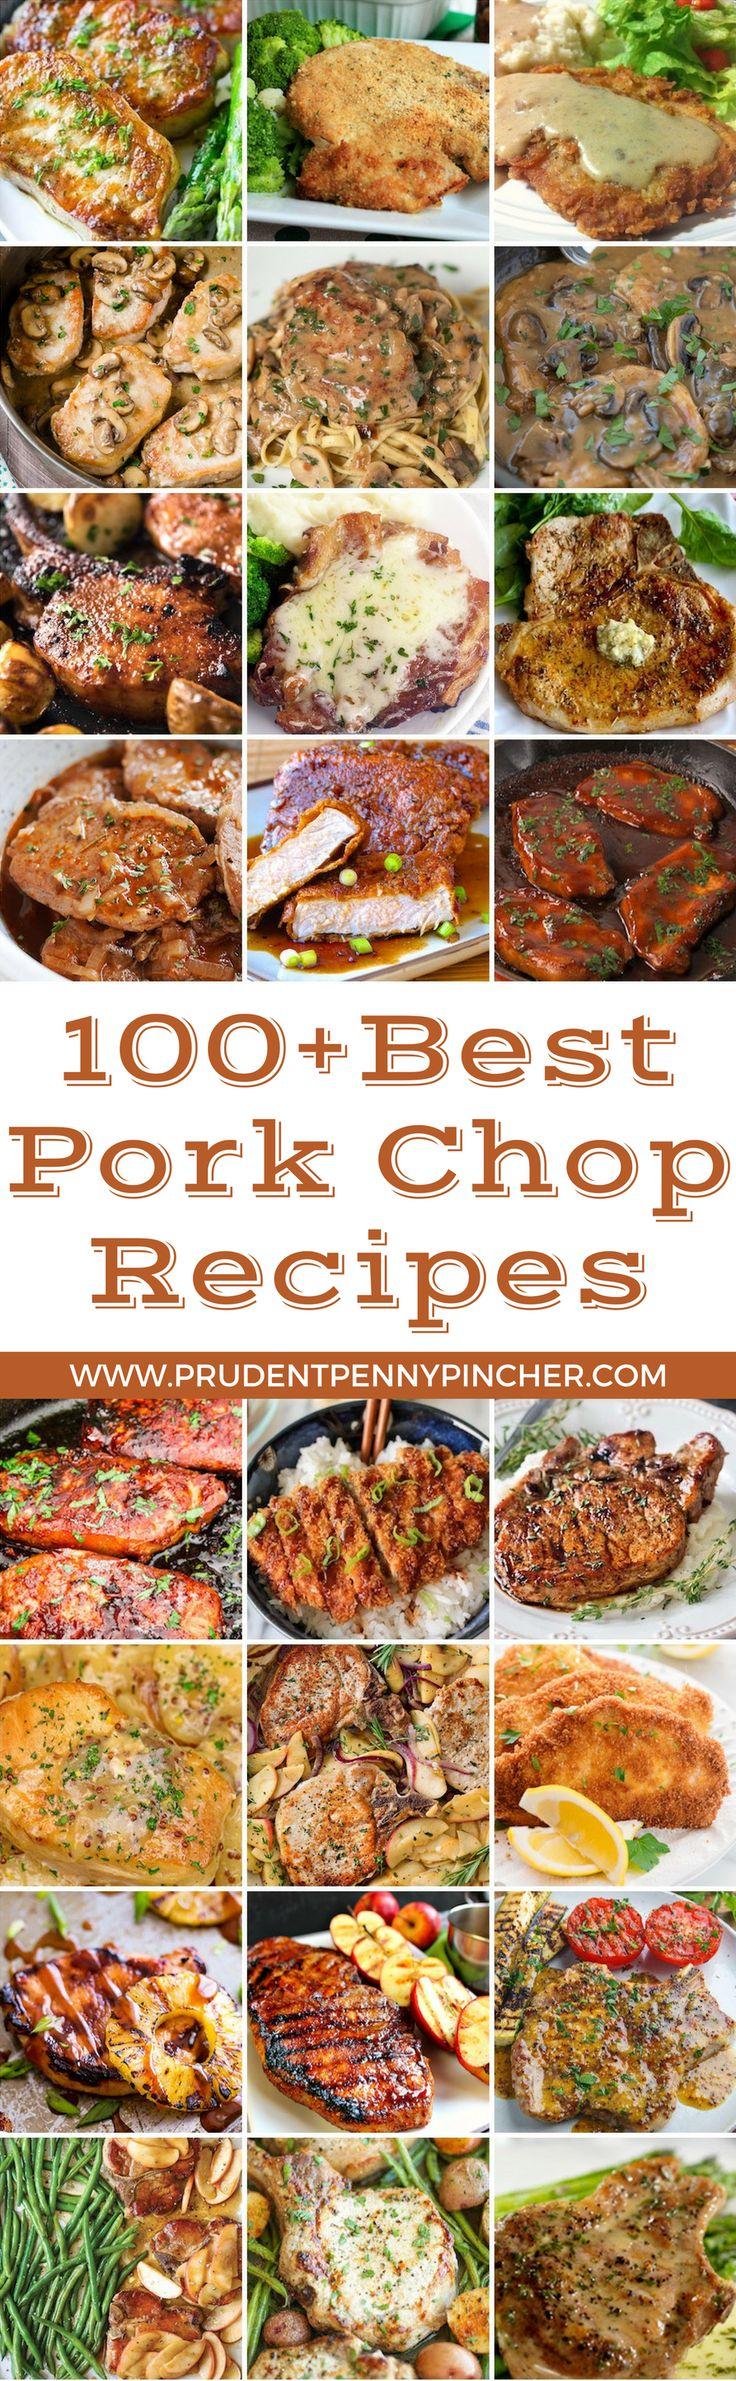 100 Best Pork Chop Recipes